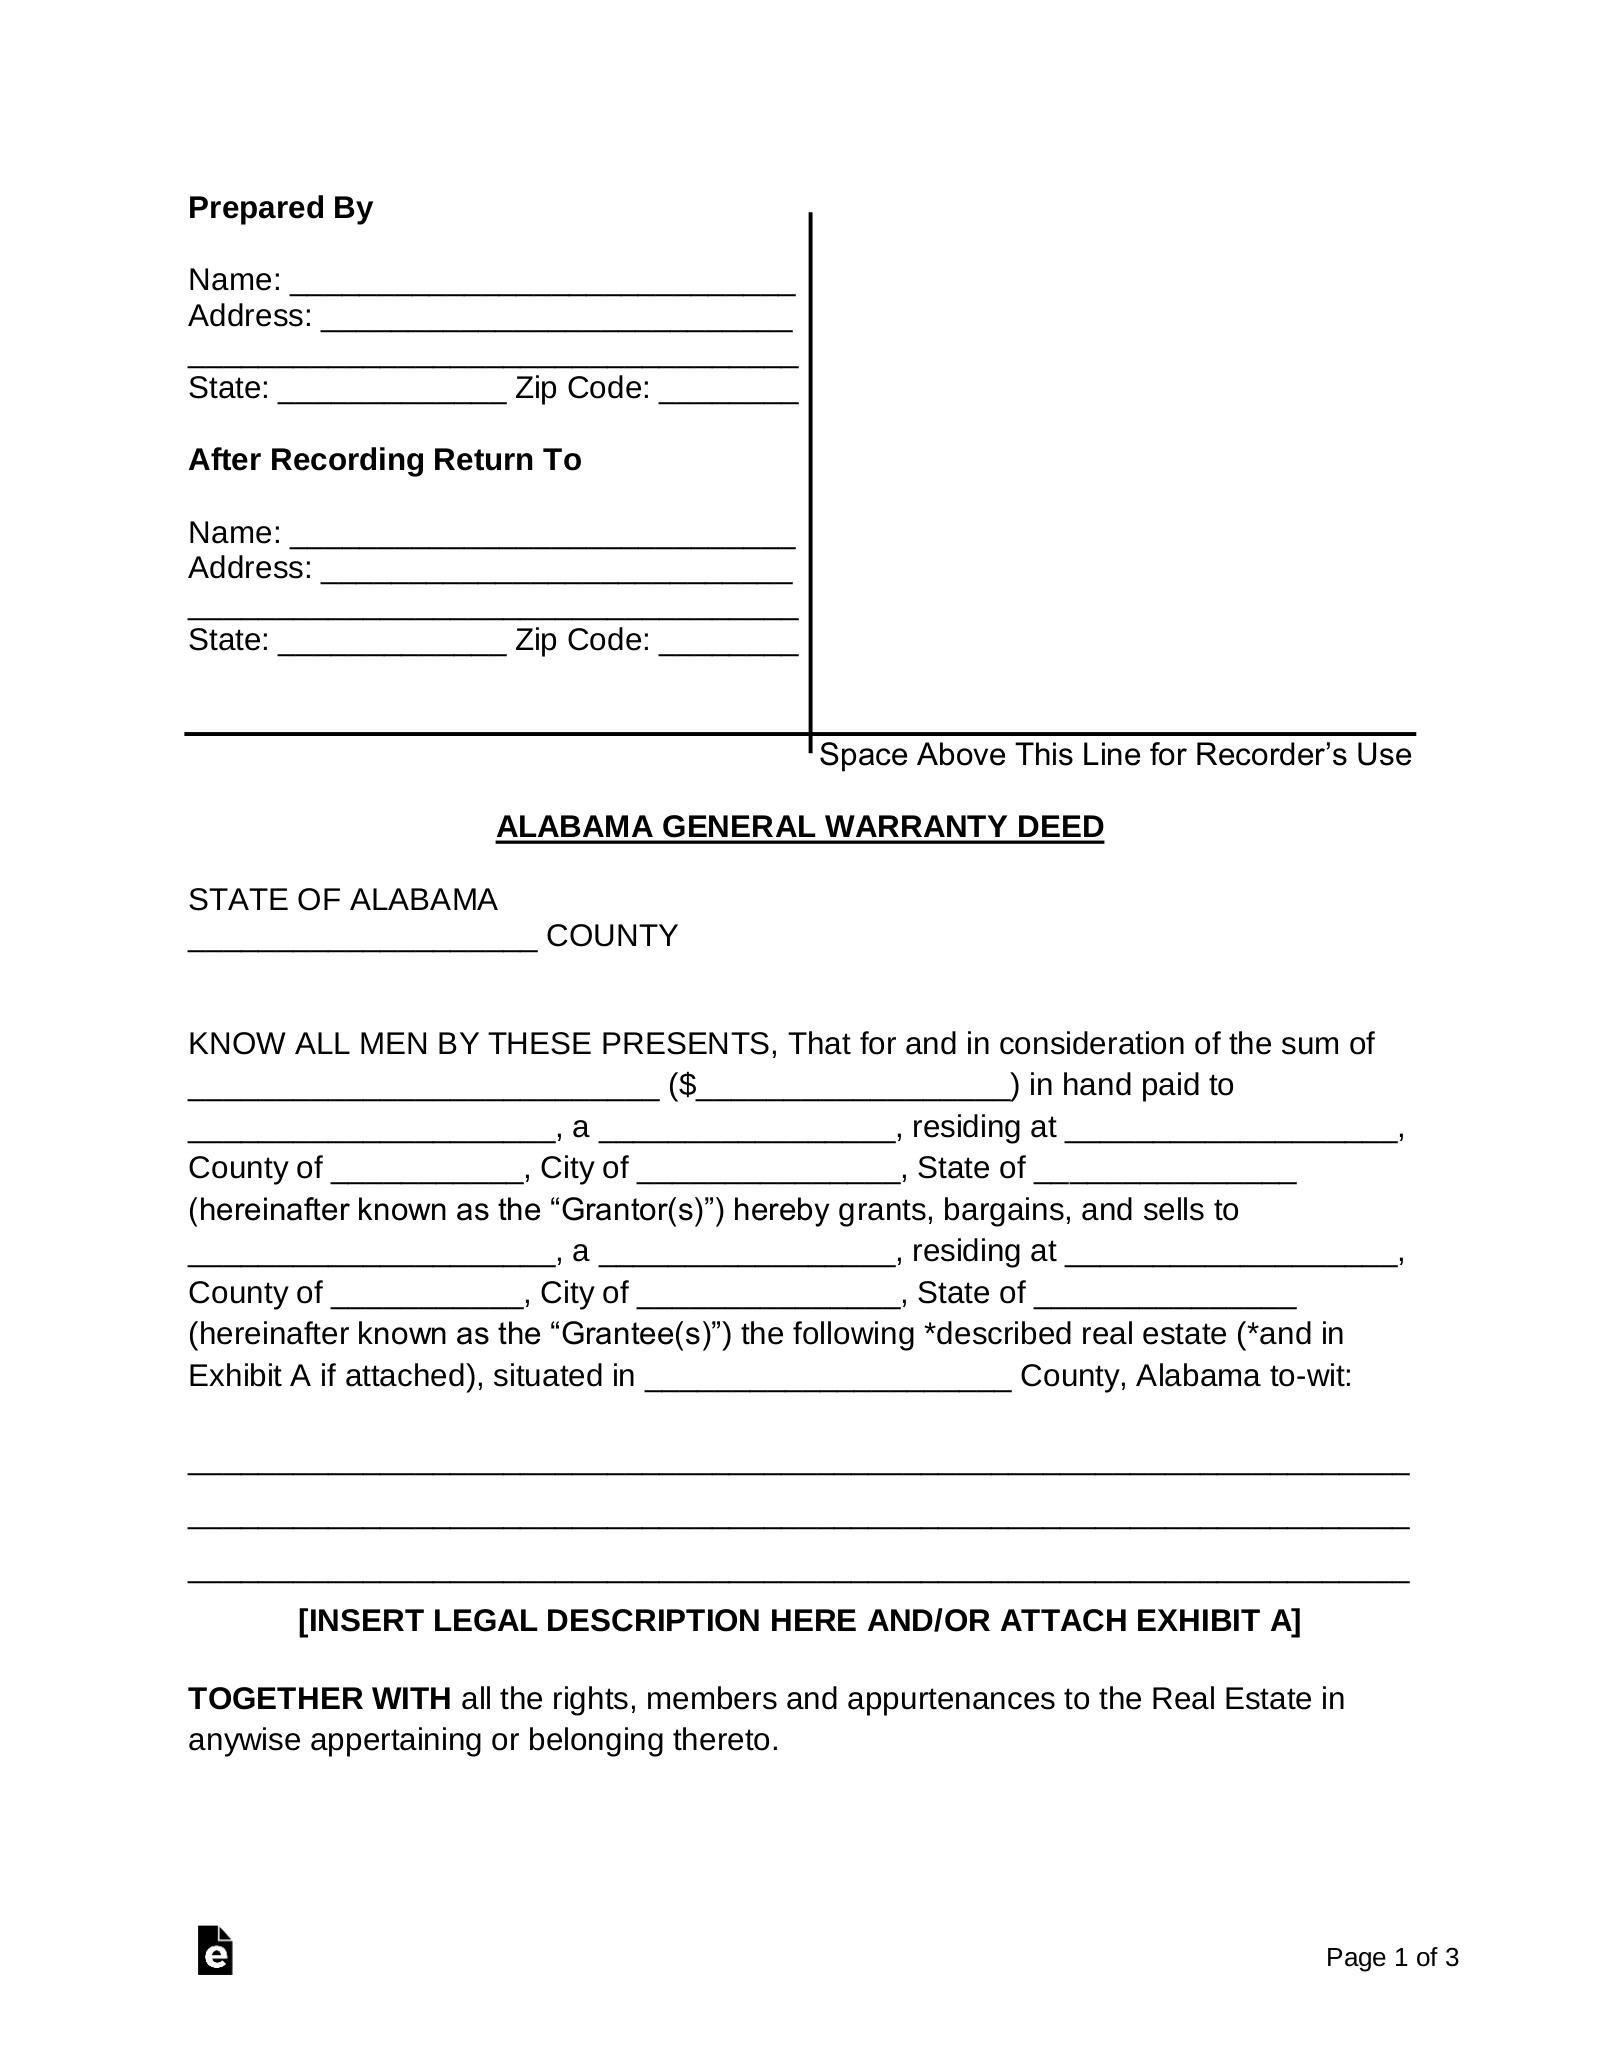 Free Alabama General Warranty Deed Form - Word | PDF